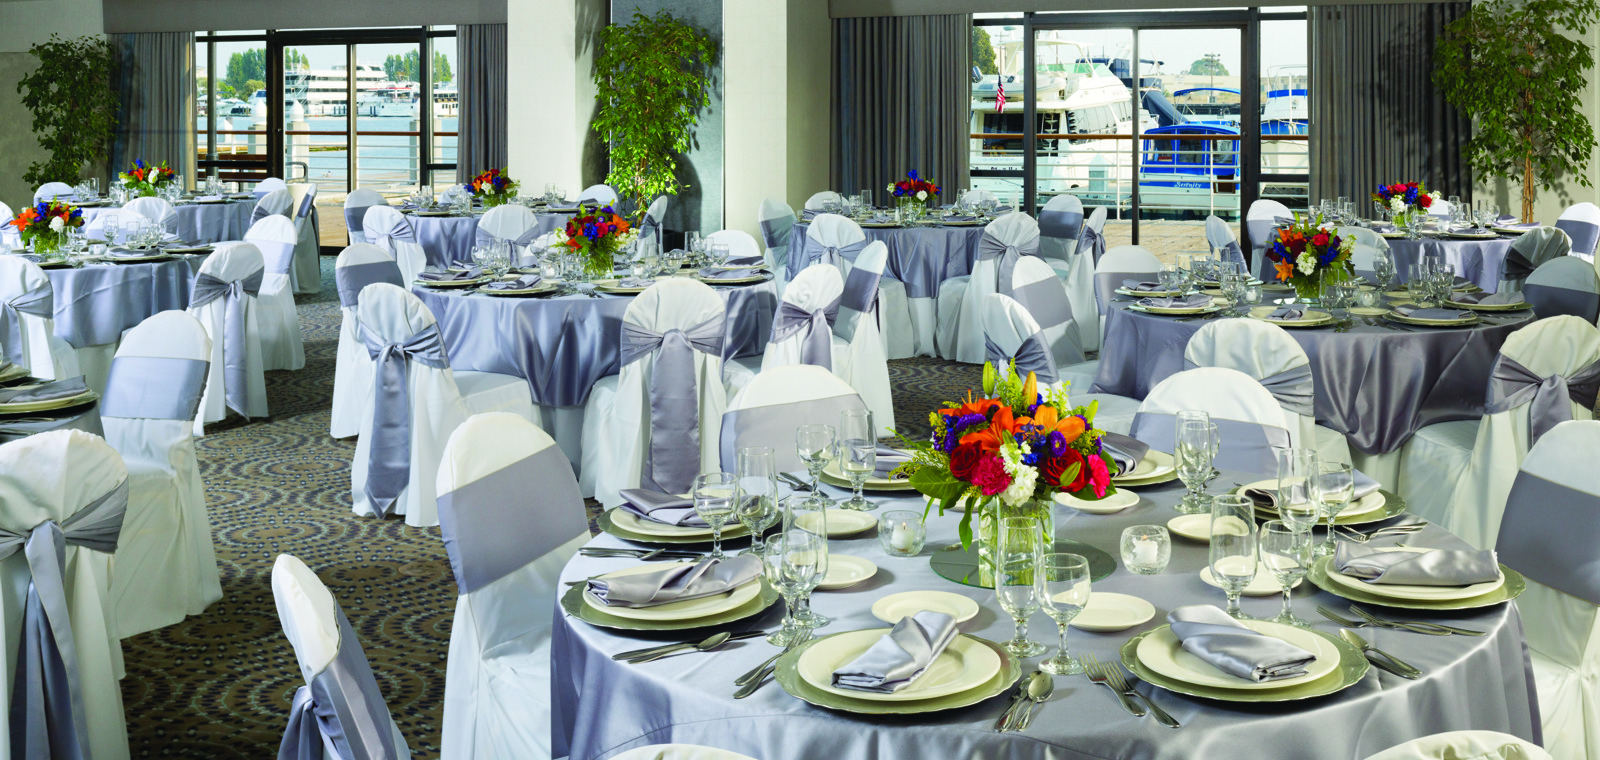 Waterfront Evetns Banquet CR11058